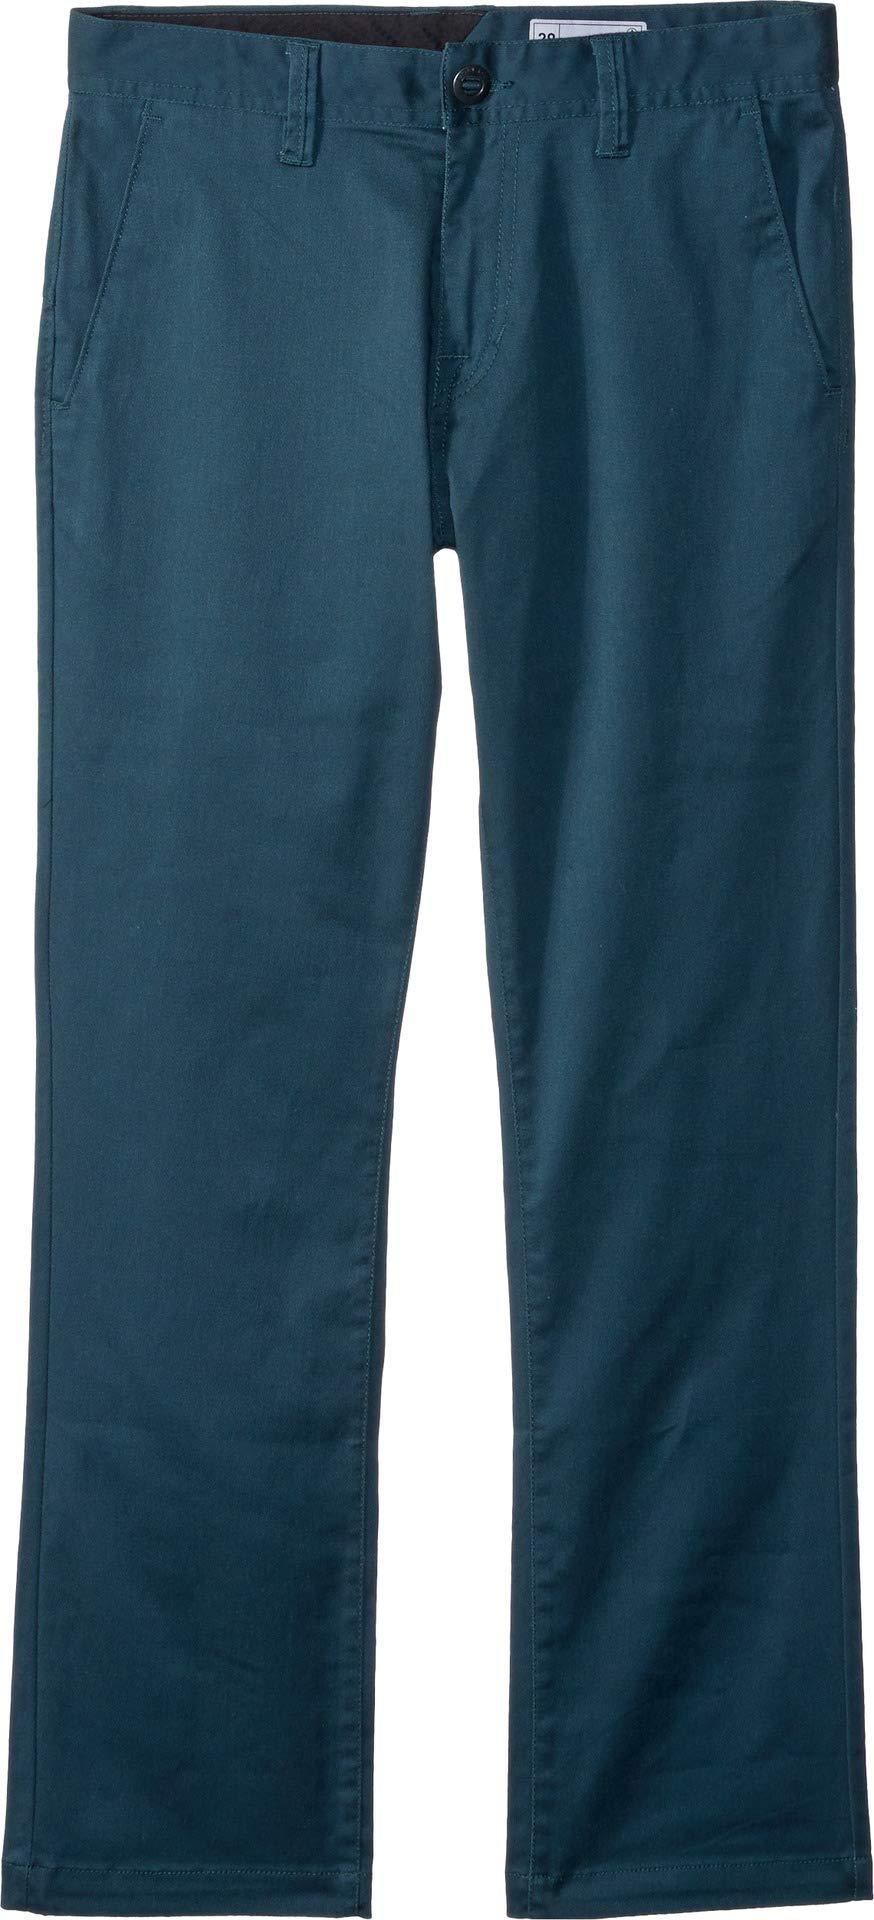 Volcom Boys' Big Frickin Modern Stretch Pant, Navy Green, 26